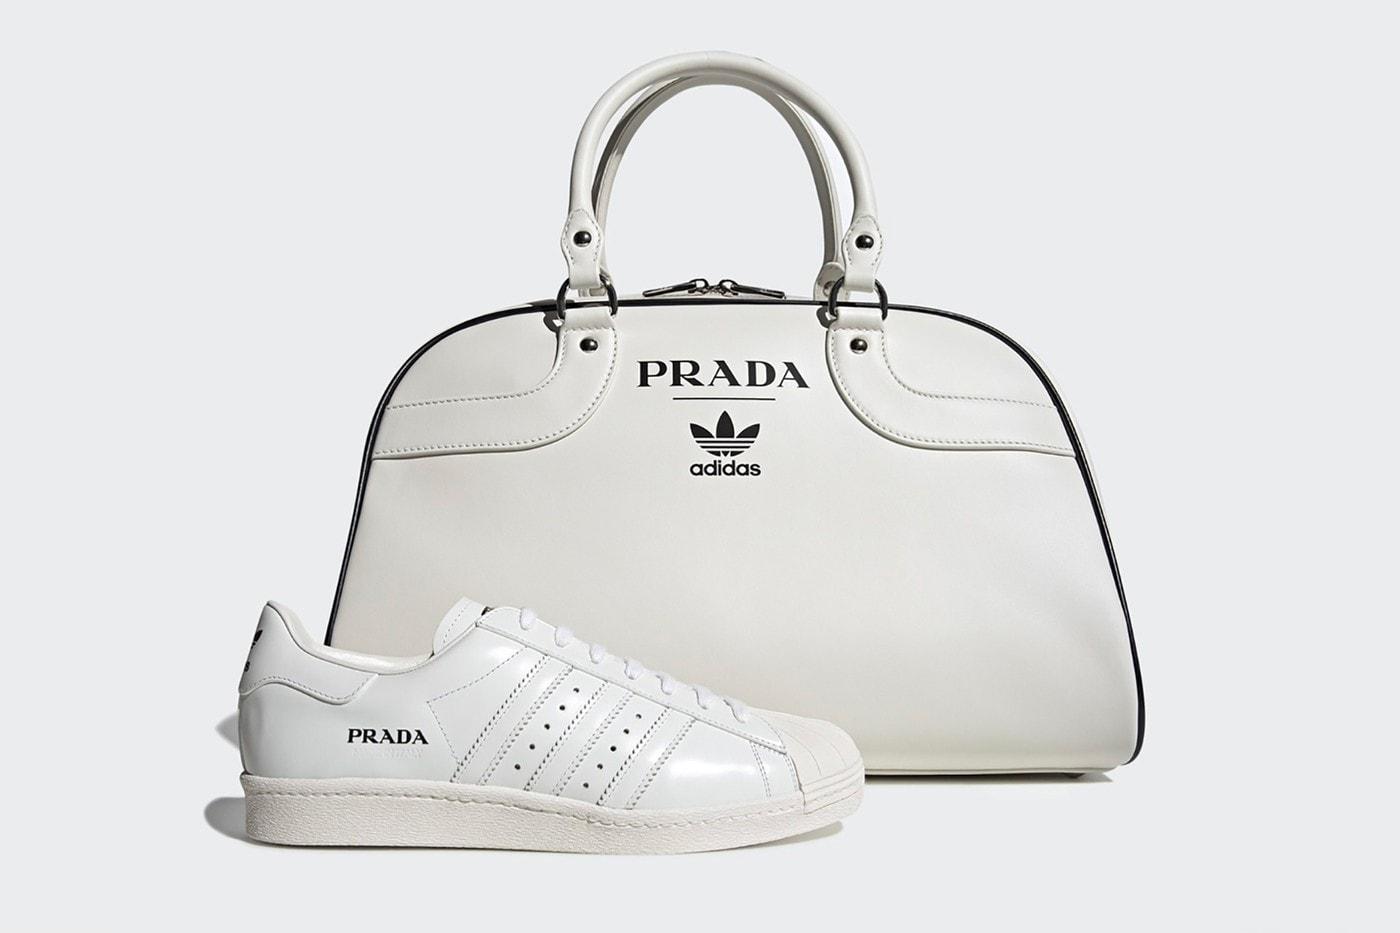 Prada adidas Originals Collaboration Sneaker Superstar Bag White Black Luxury Designer Sports Brand